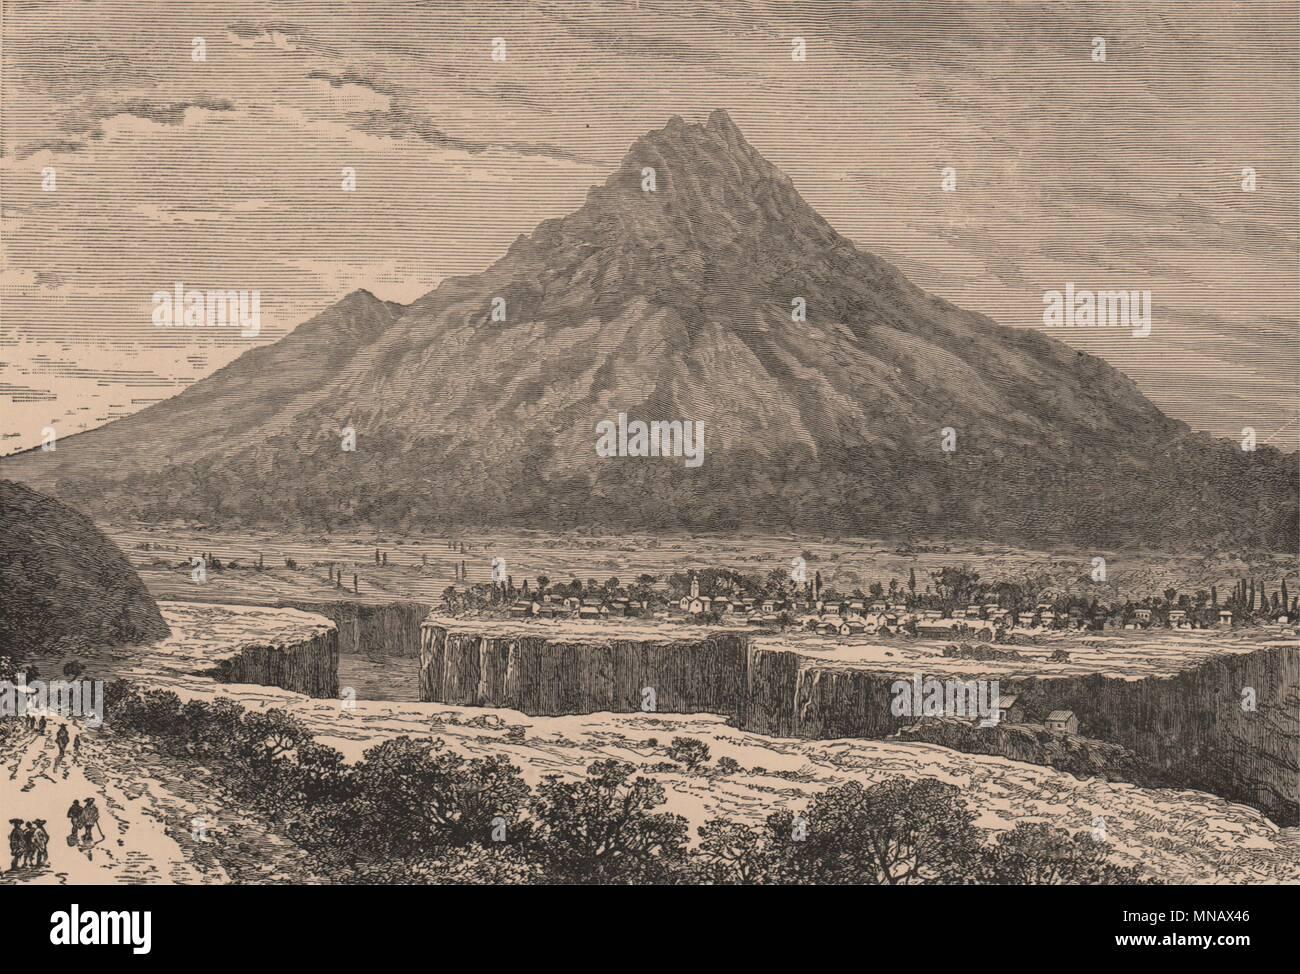 Ibarra, and the Imbabura Volcano. Ecuador 1885 old antique print picture - Stock Image